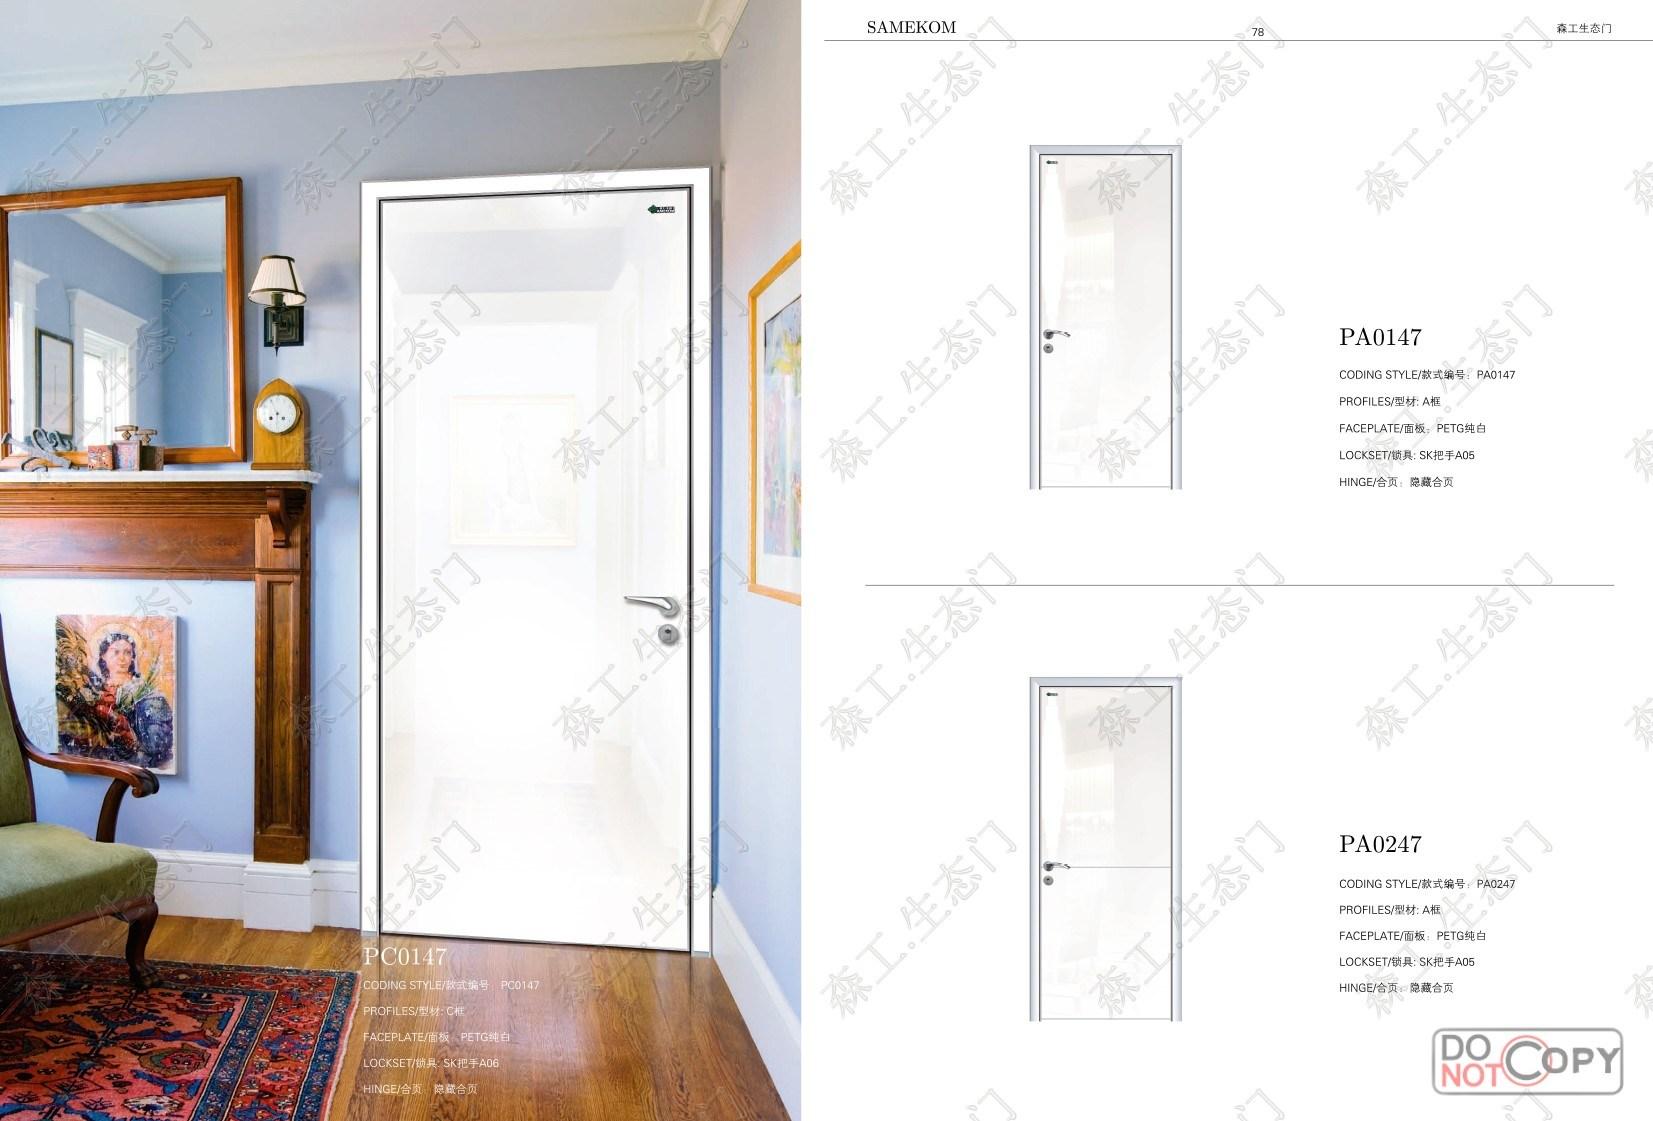 Soundproofing Apartment Walls - Interior Design